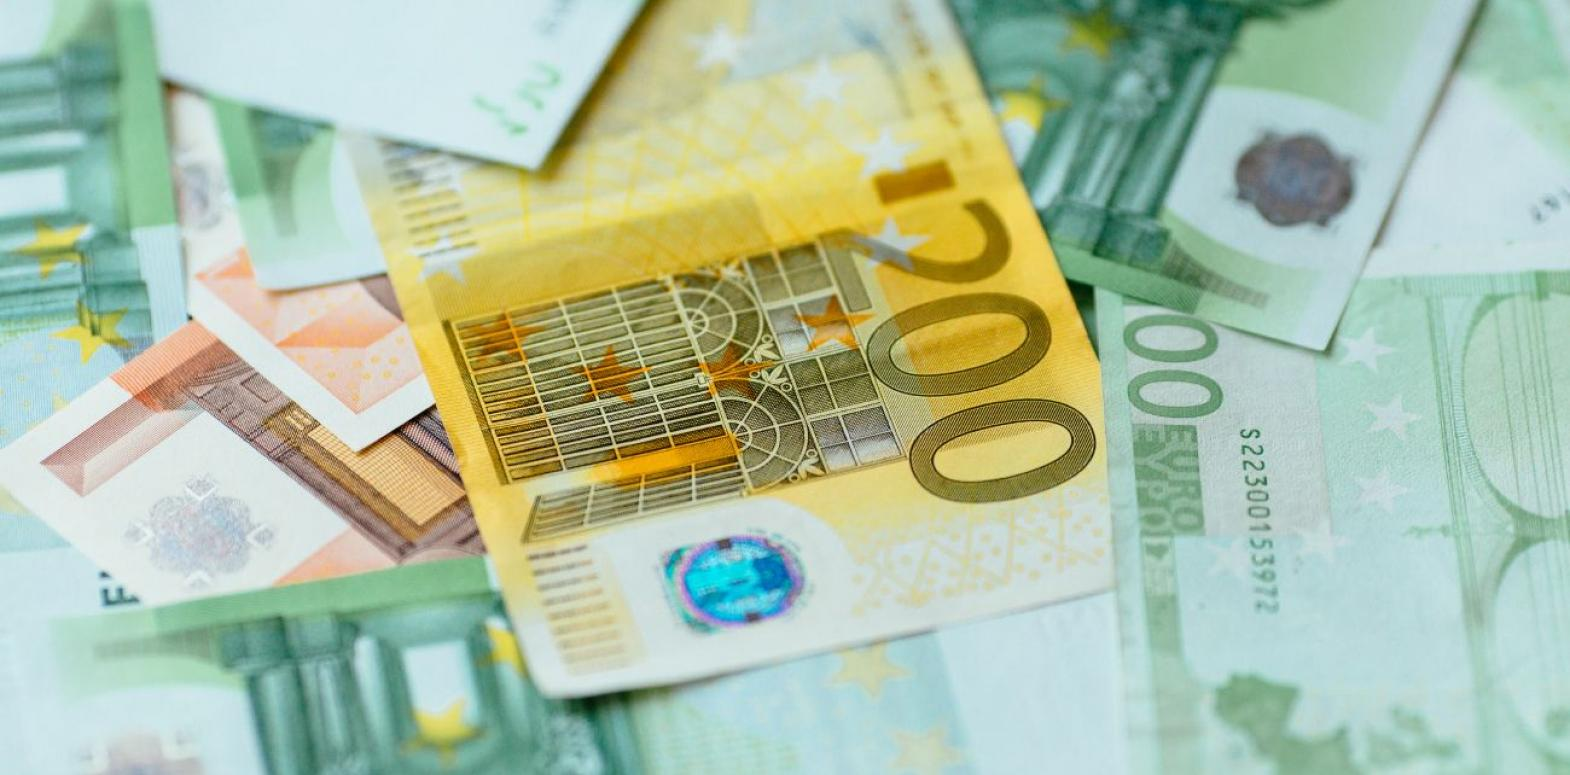 Курс евро упал до минимума за год